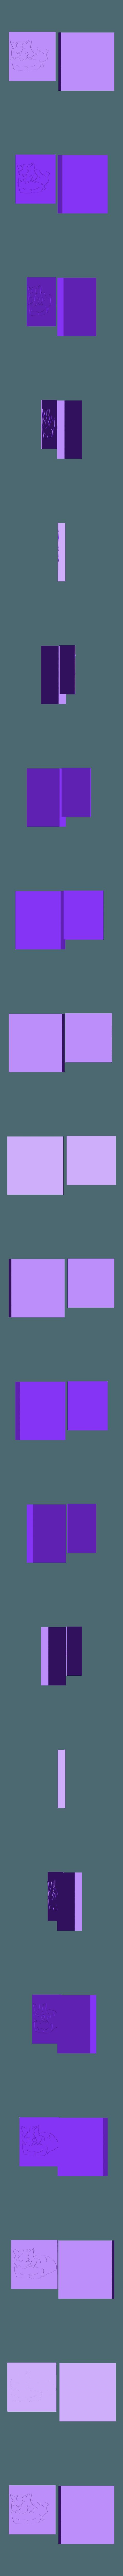 Mini Presse Stratomaker empreinte chat.stl Download STL file Mini Press #STRATOMAKER • 3D printer design, Jojo_bricole